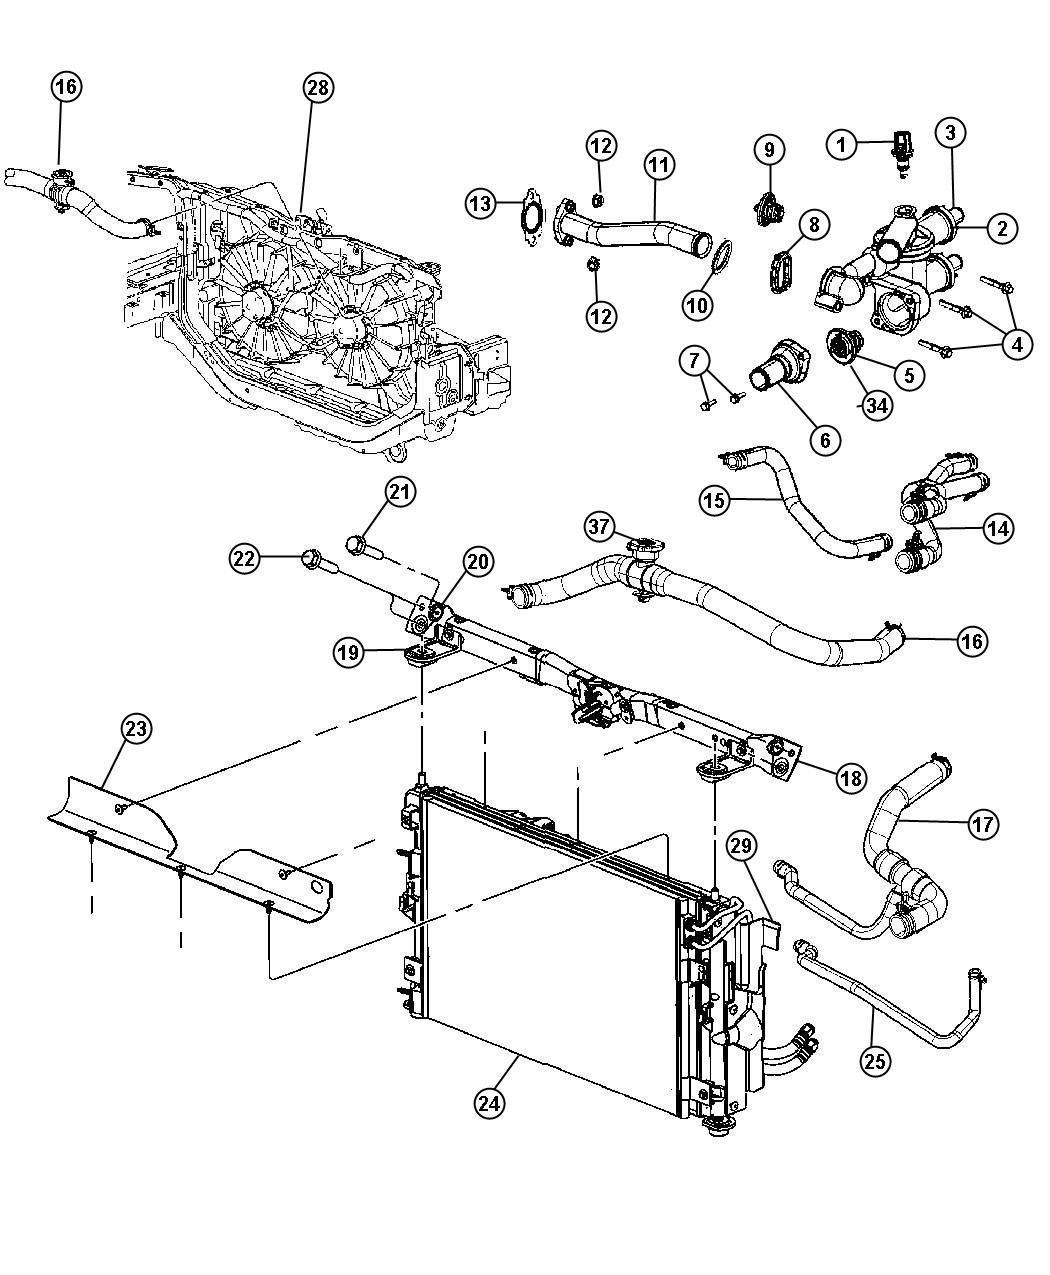 2007 dodge charger 2.7l fuse box diagram